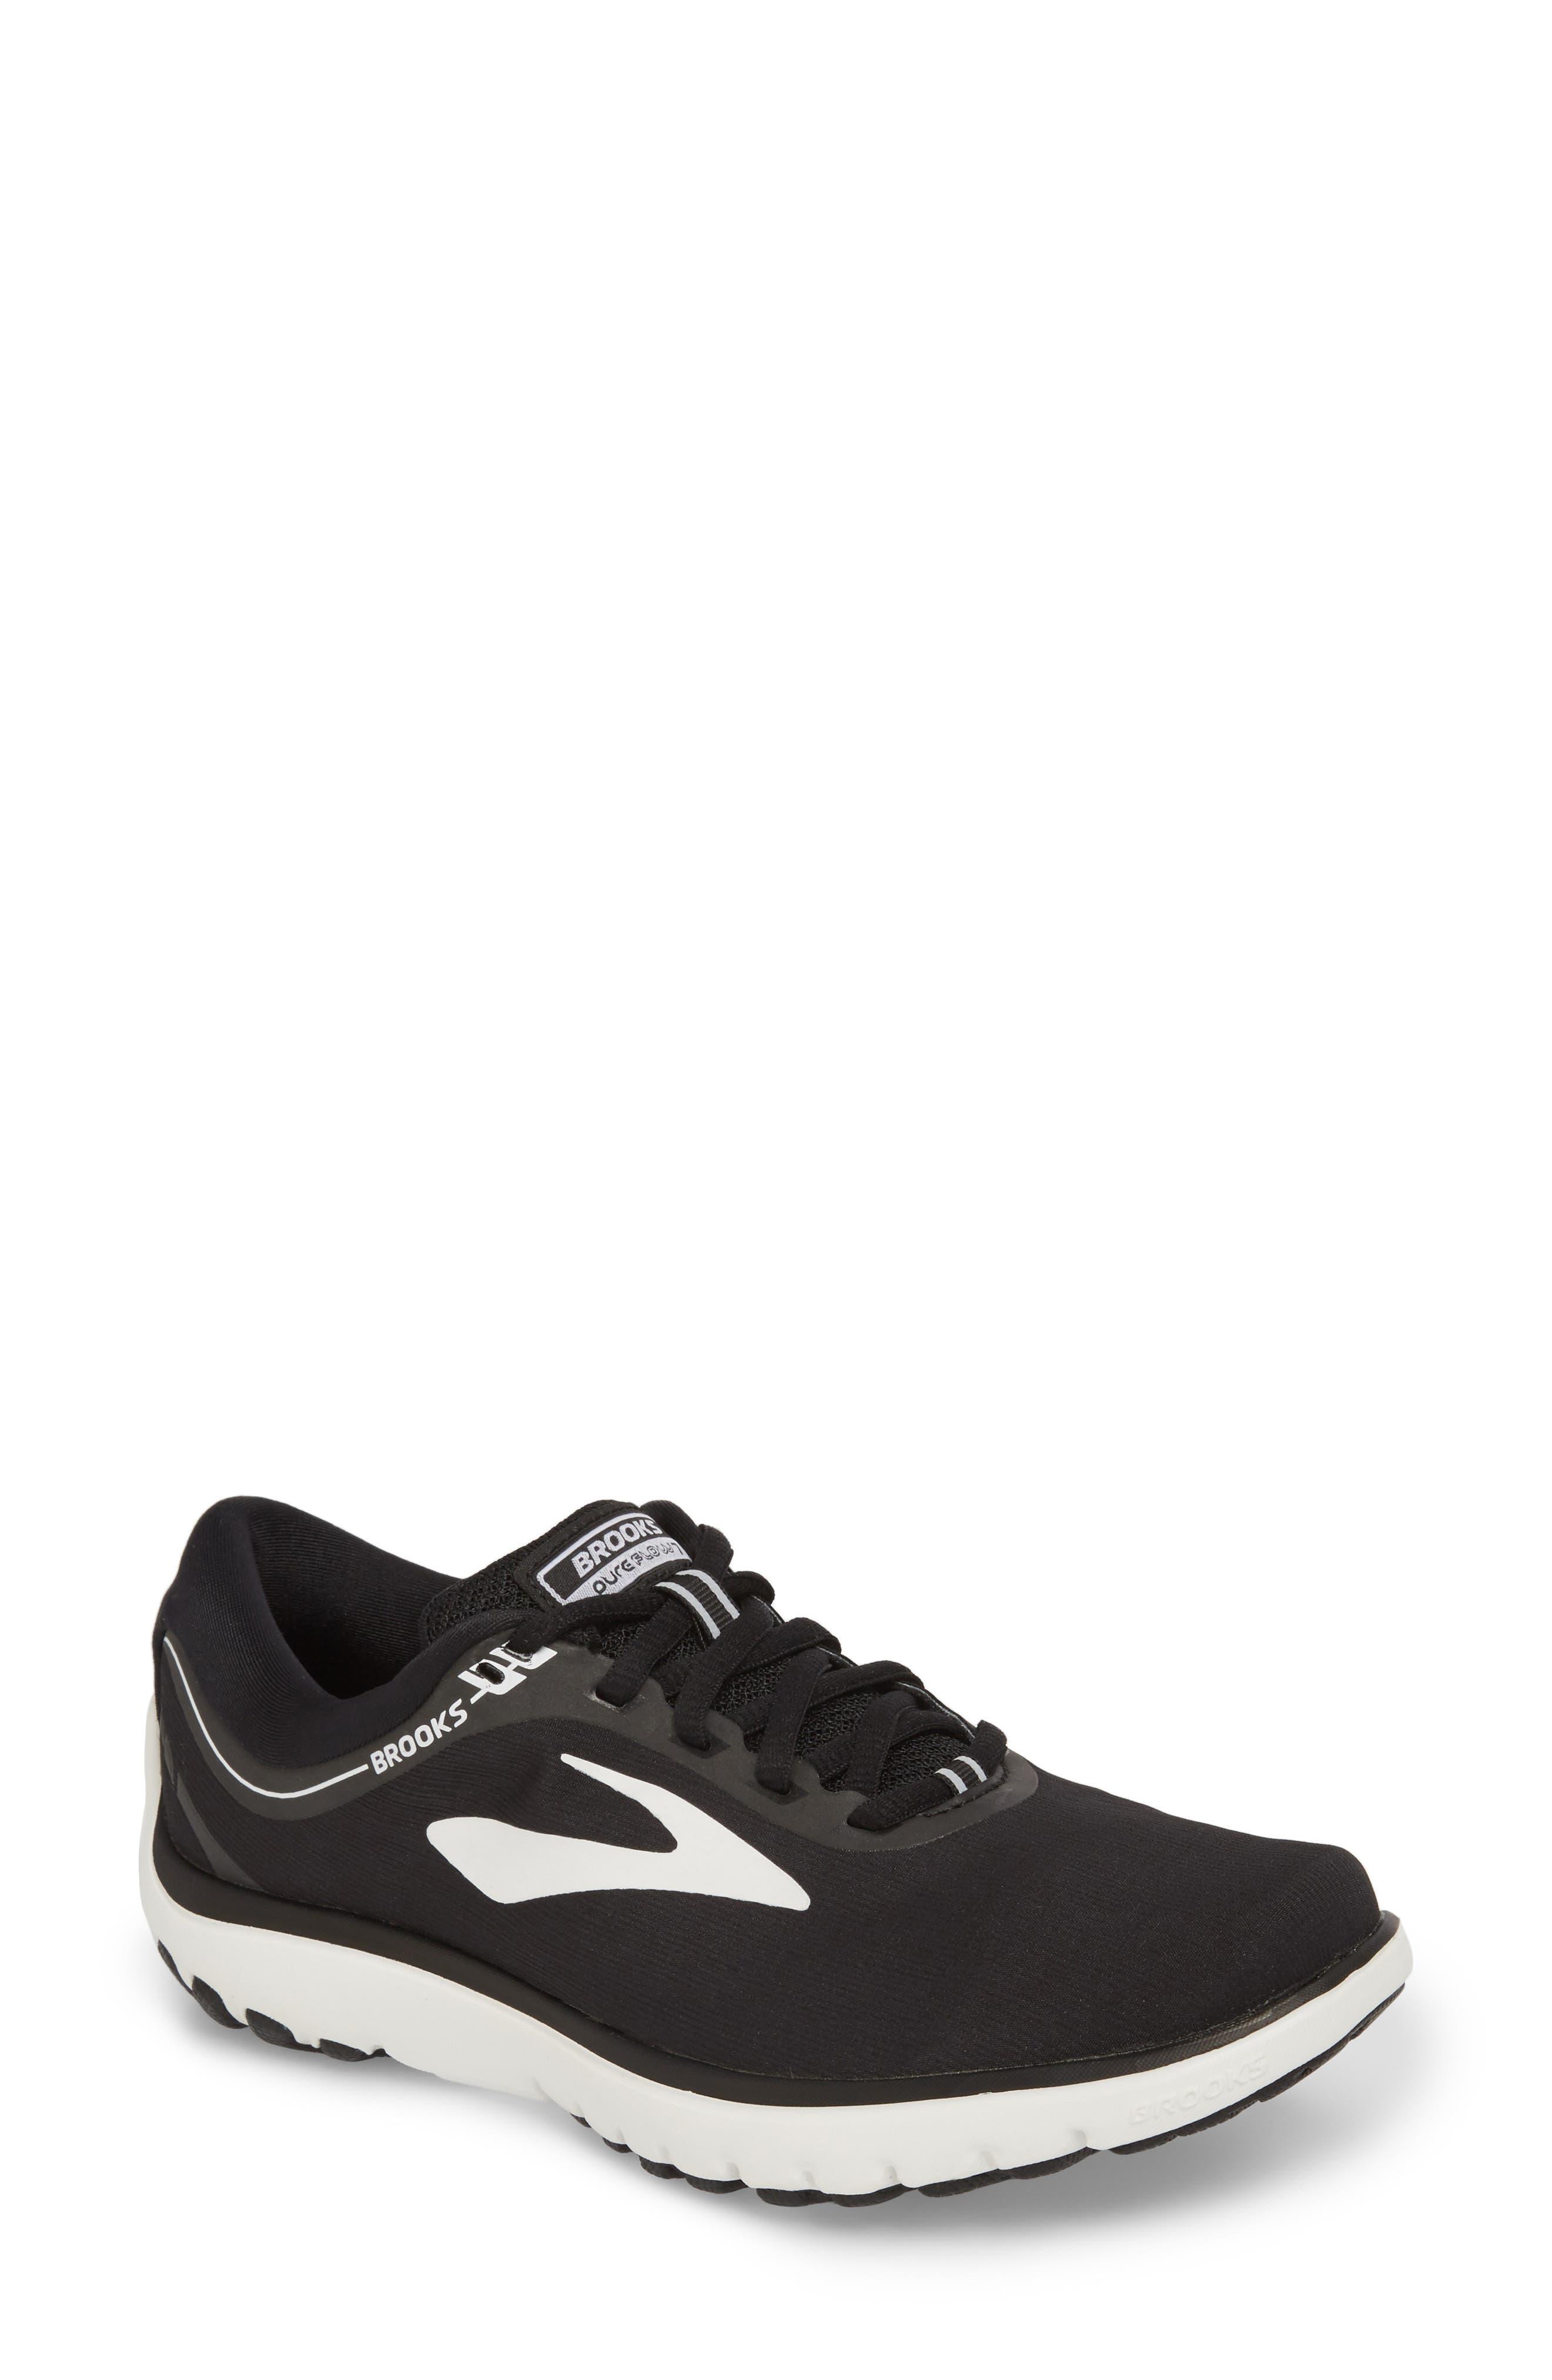 df73bf68049 Brooks Women s Pureflow 7 Running Shoes